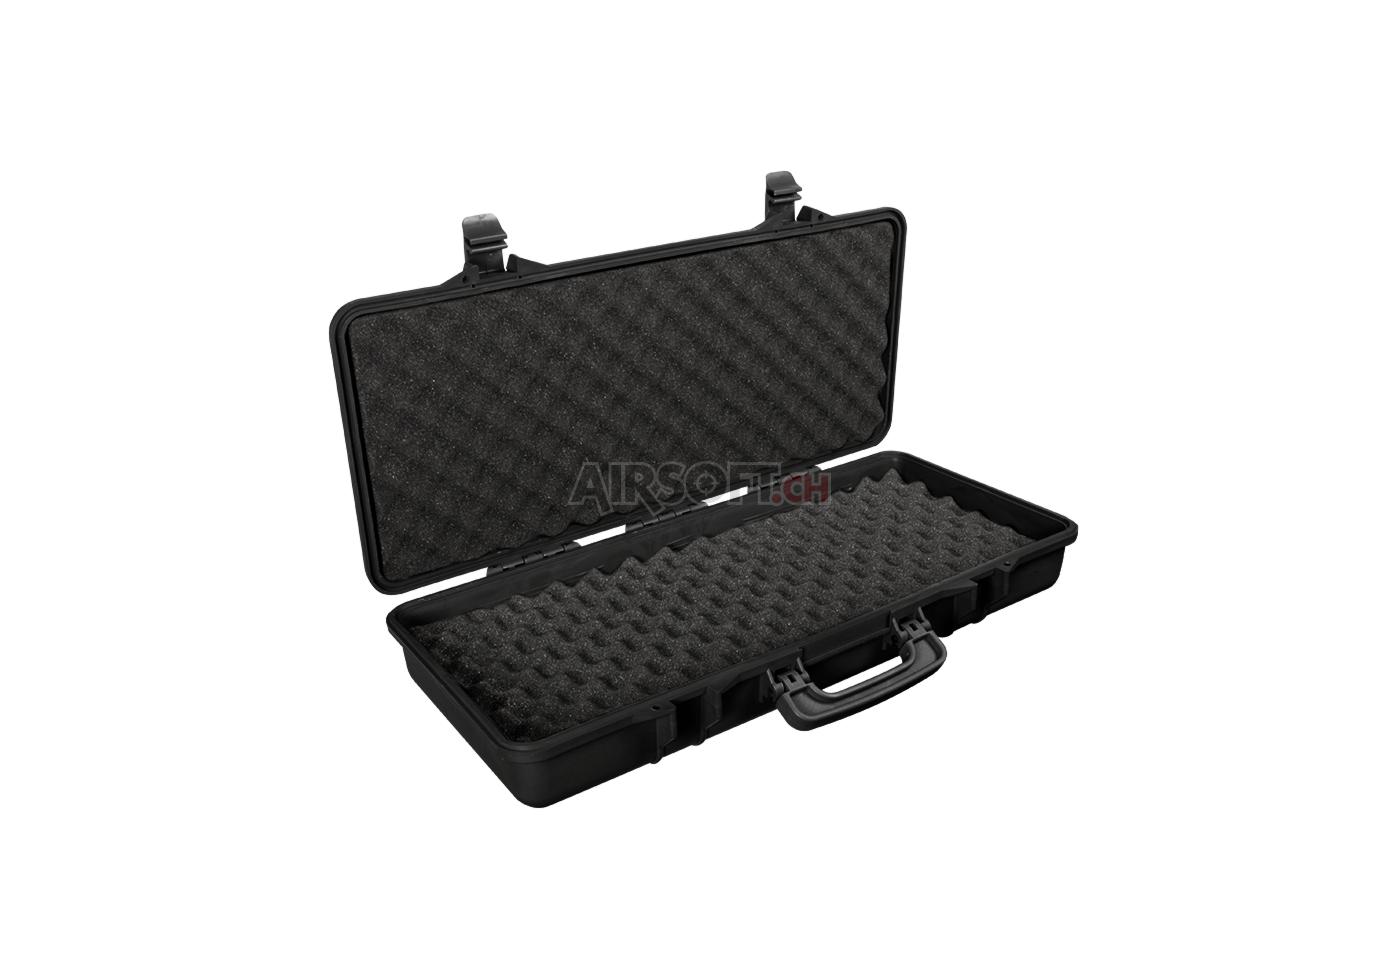 Bearing Puller Nexus : Smg hard case cm black src gewehrkoffer